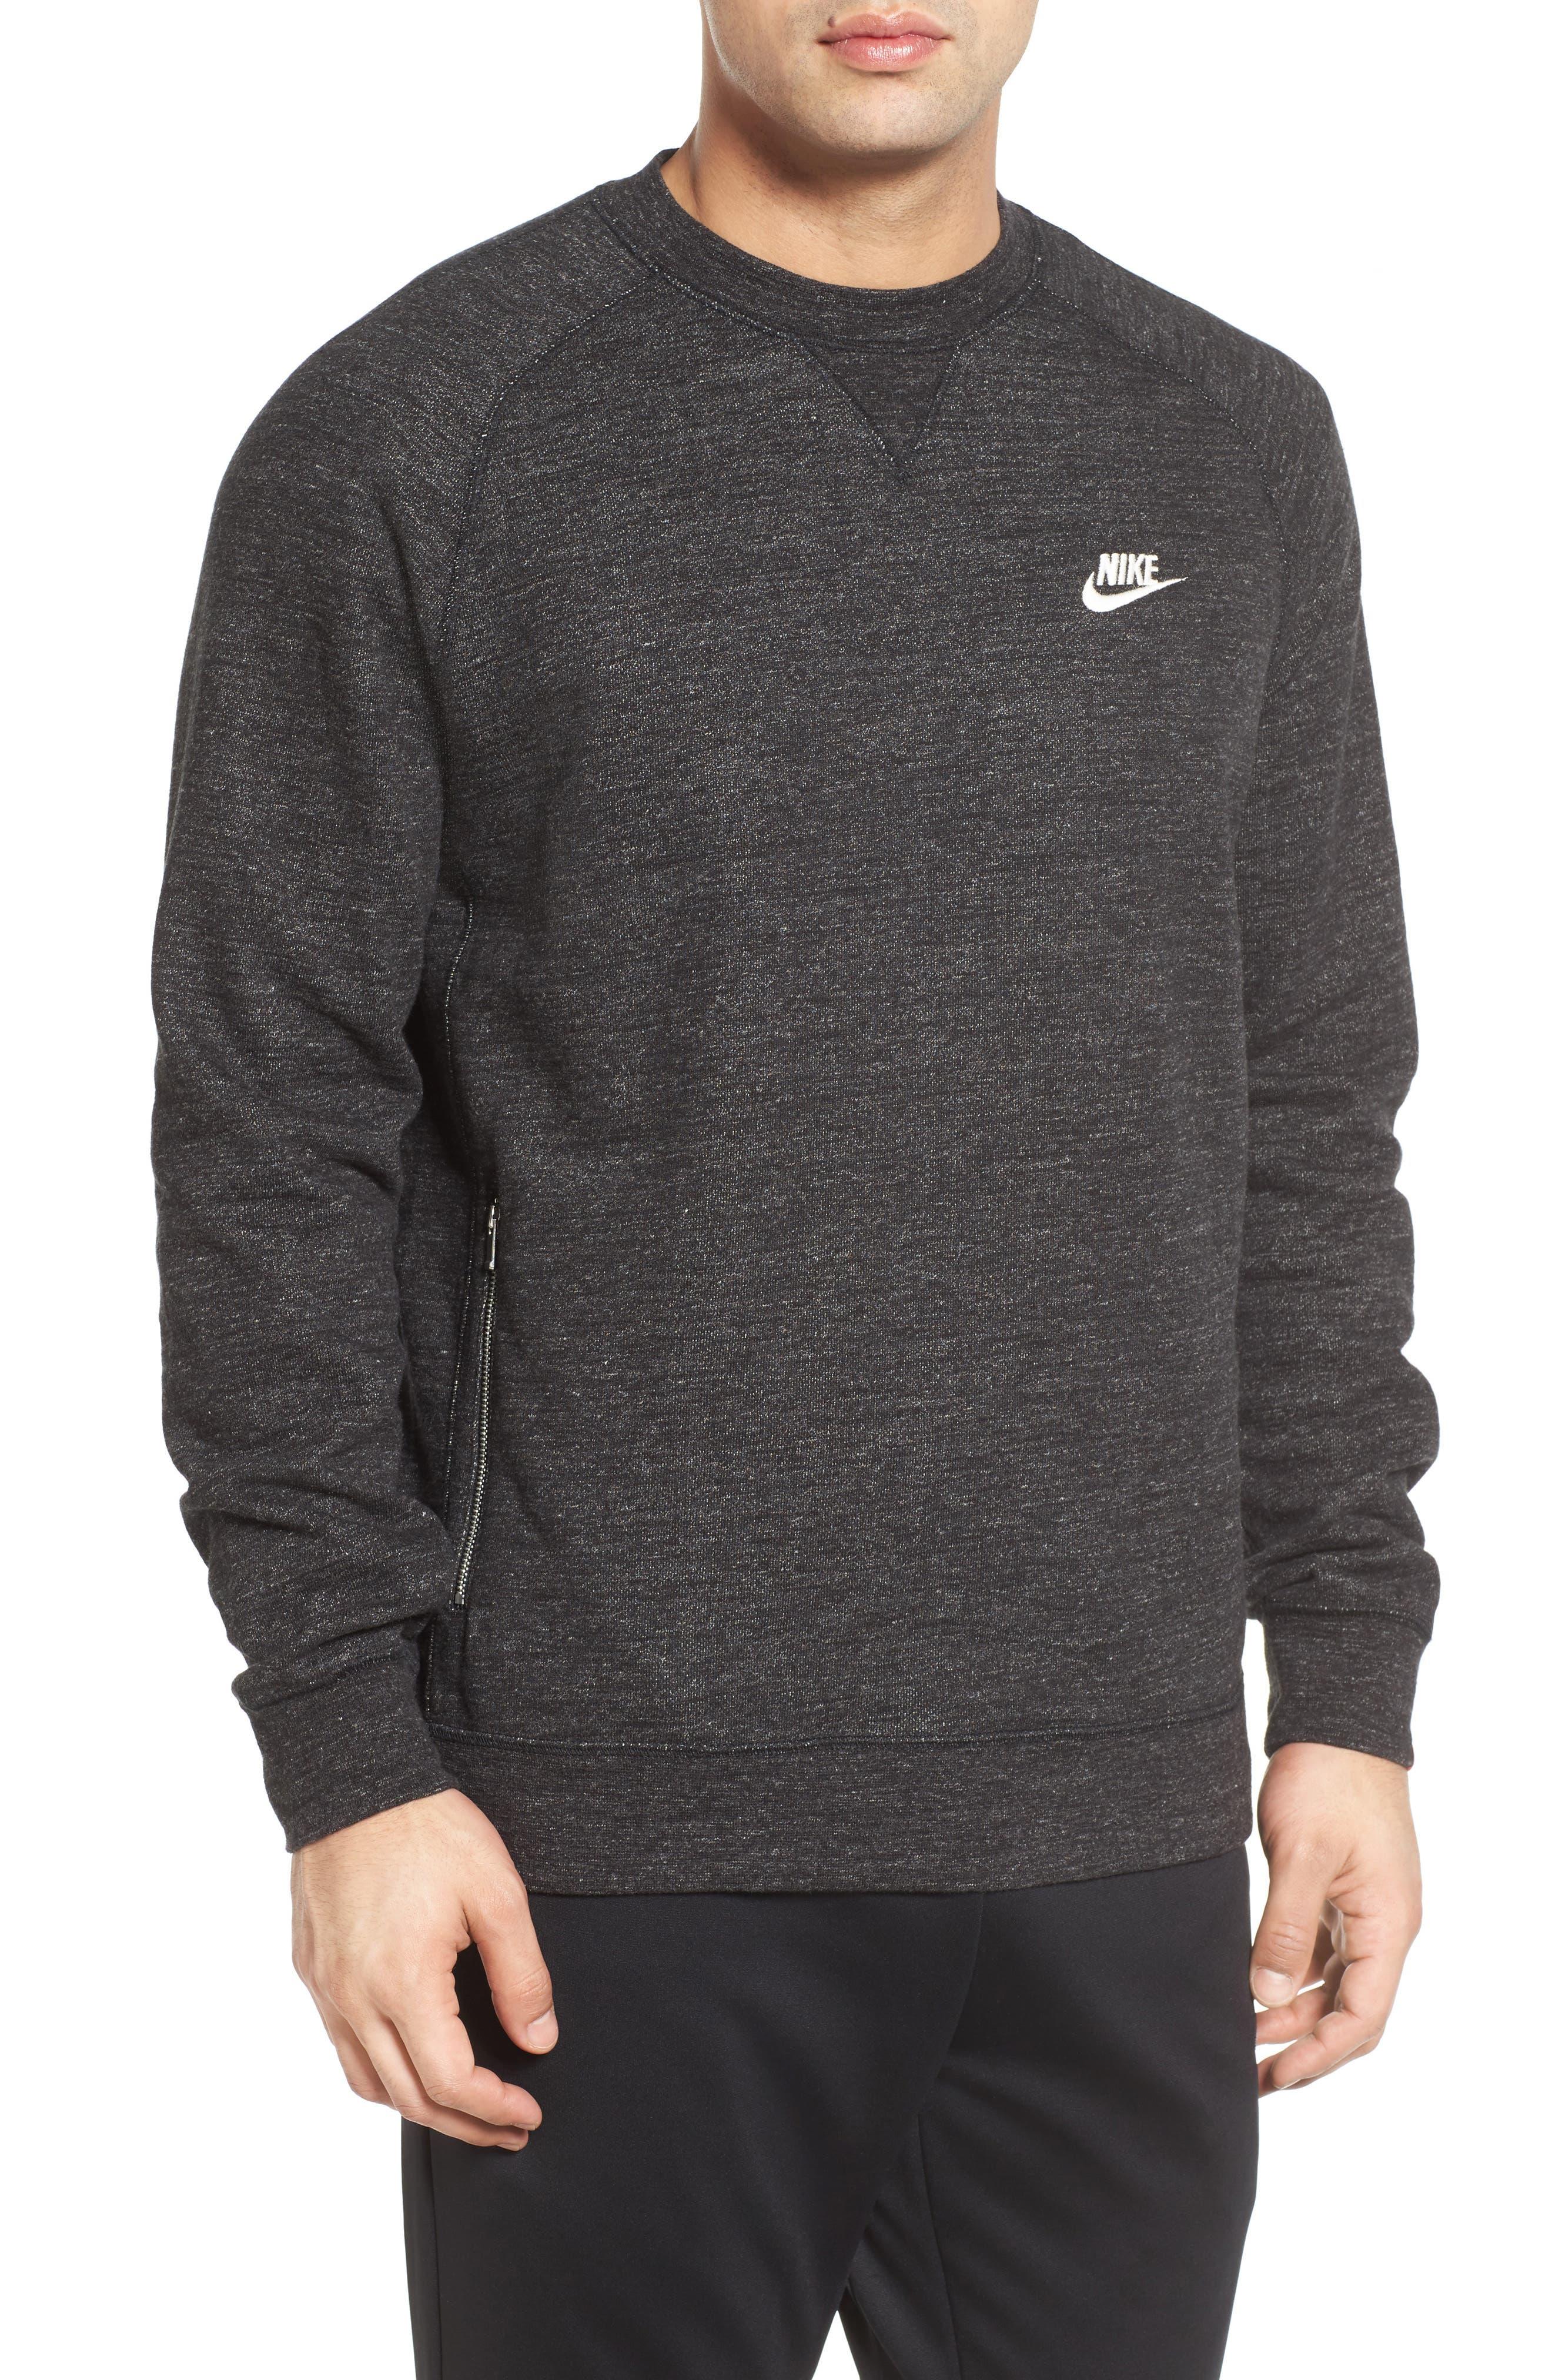 Alternate Image 1 Selected - Nike Legacy Raglan Crewneck Sweatshirt